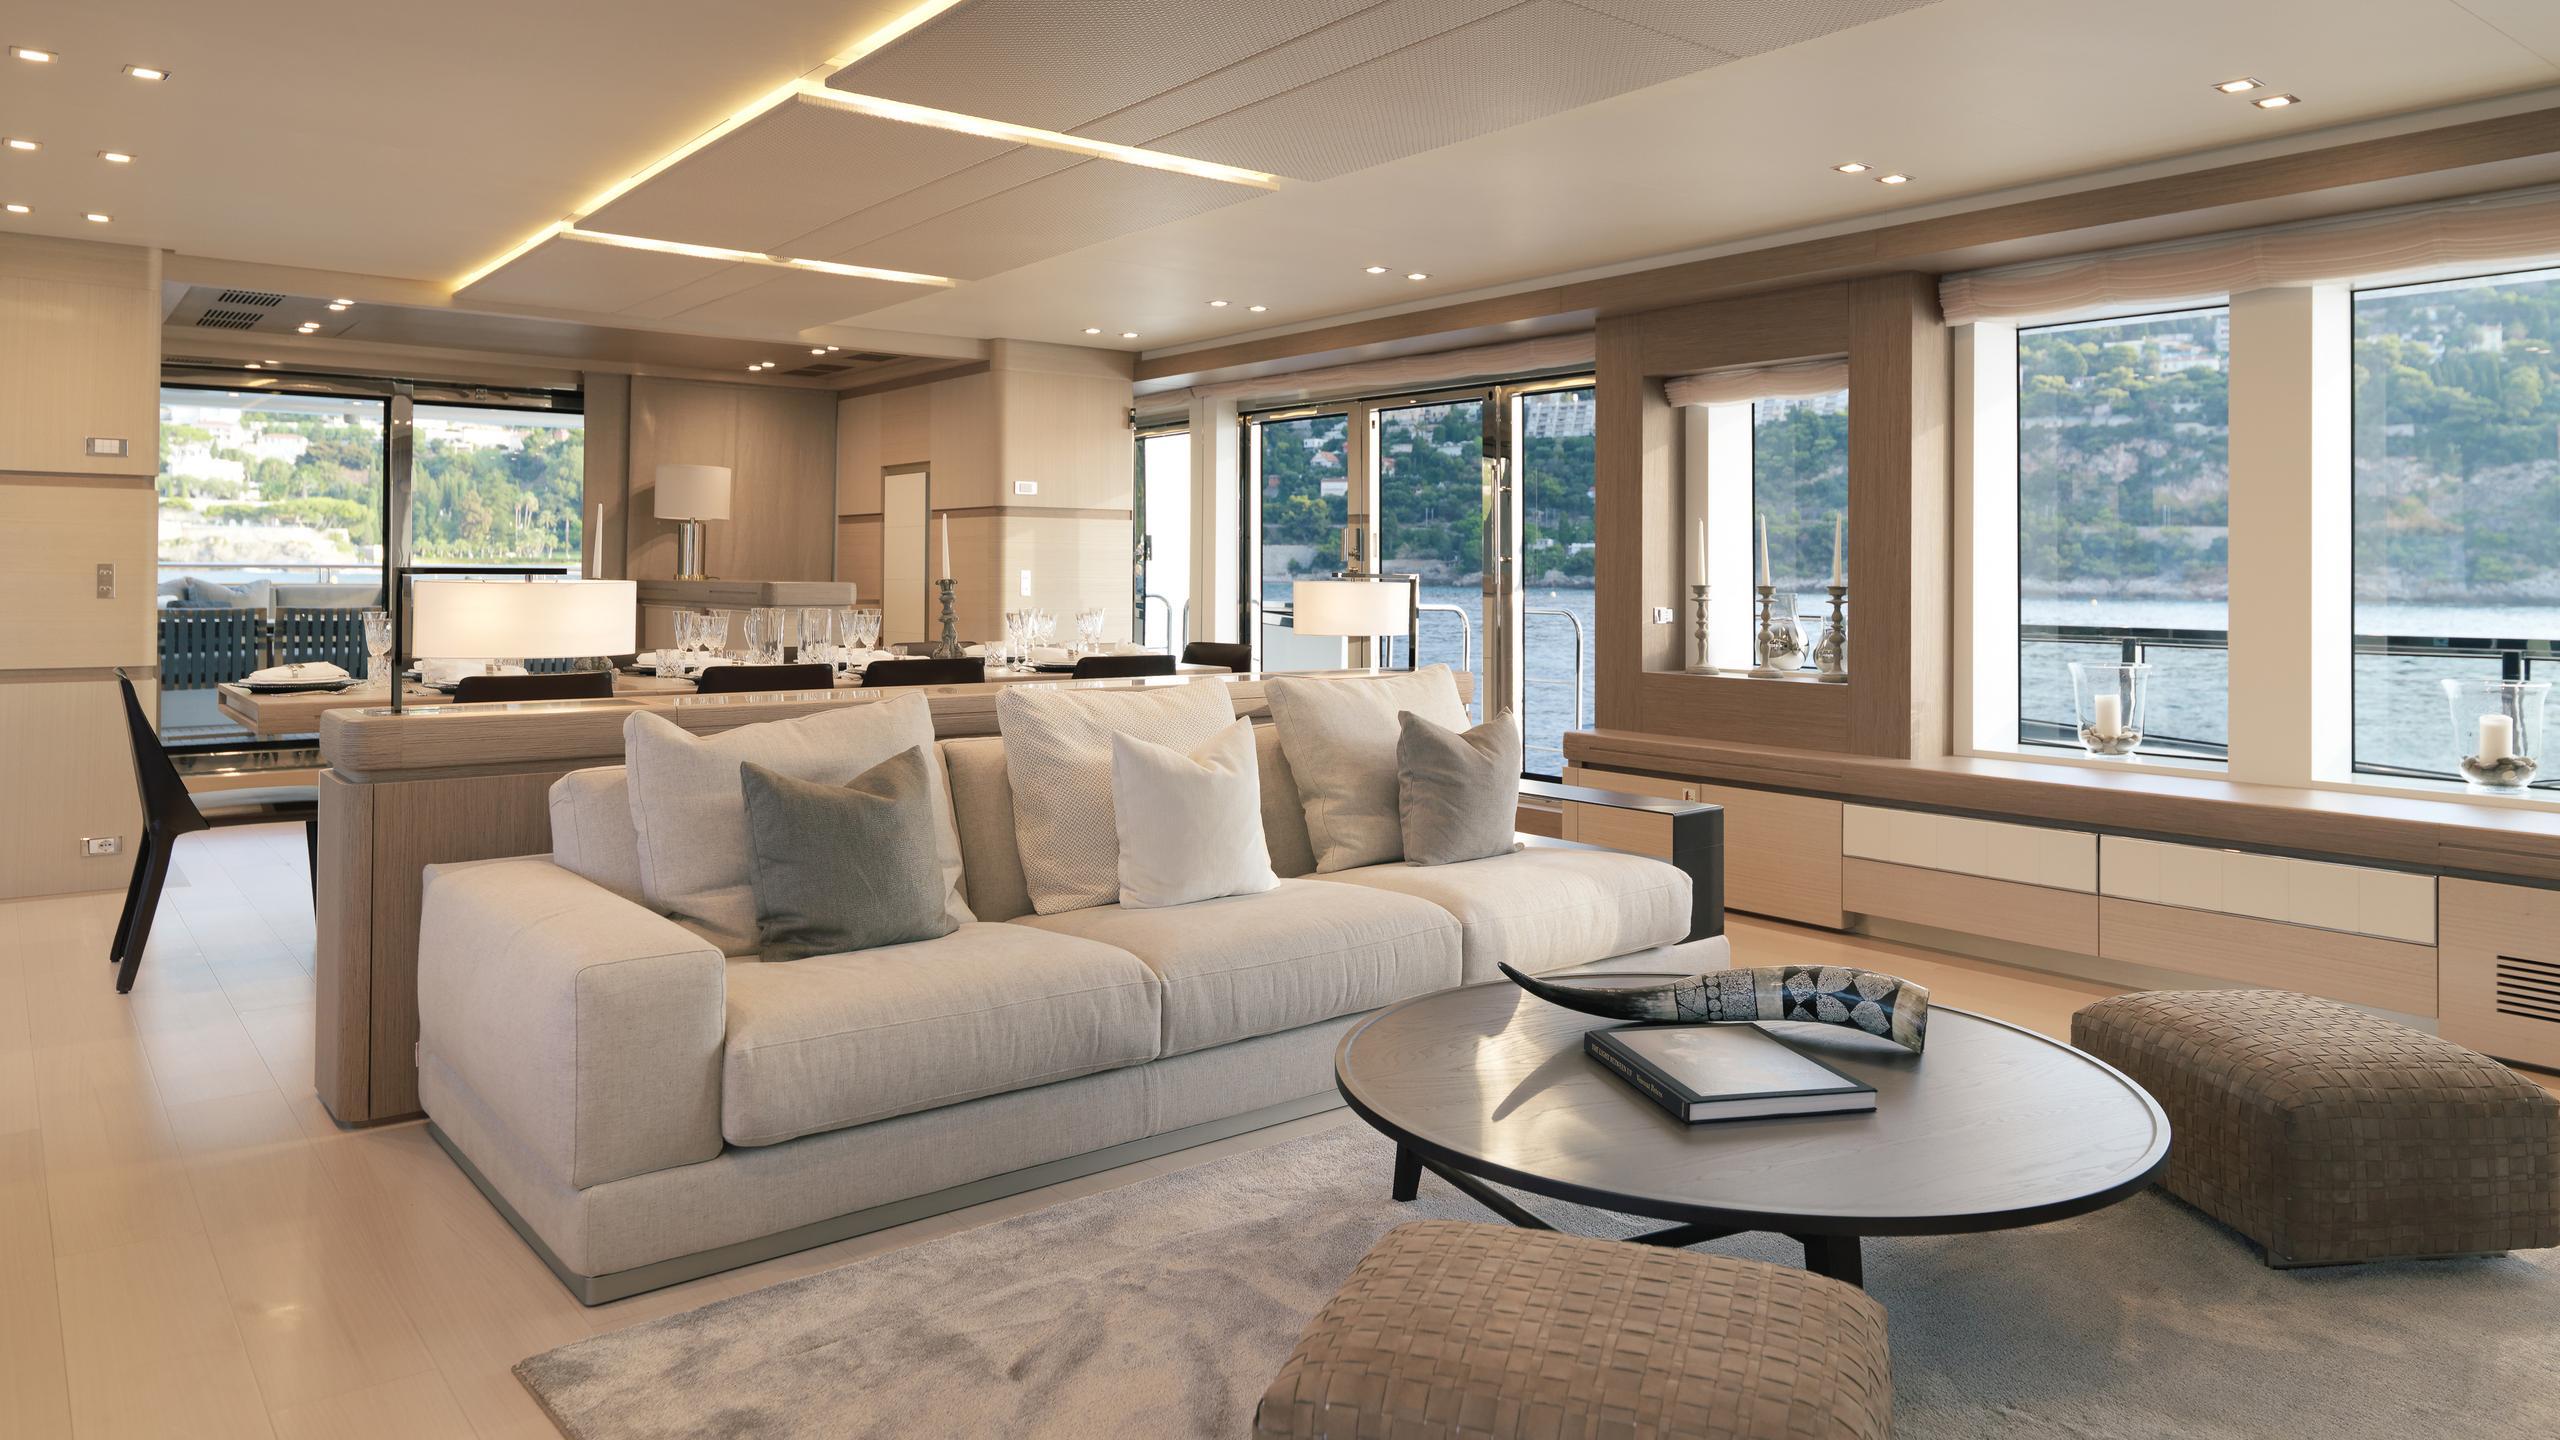 k-divine-motor-yacht-palumbo-40s-2015-40m-saloon